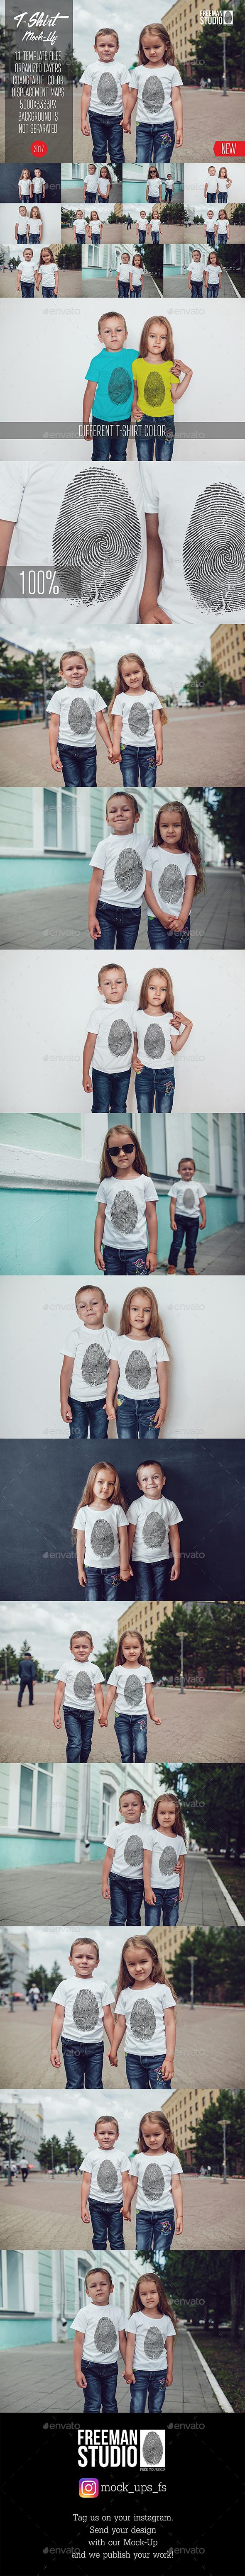 Kids T-Shirt Mock-Up Vol.7 2017 - Product Mock-Ups Graphics